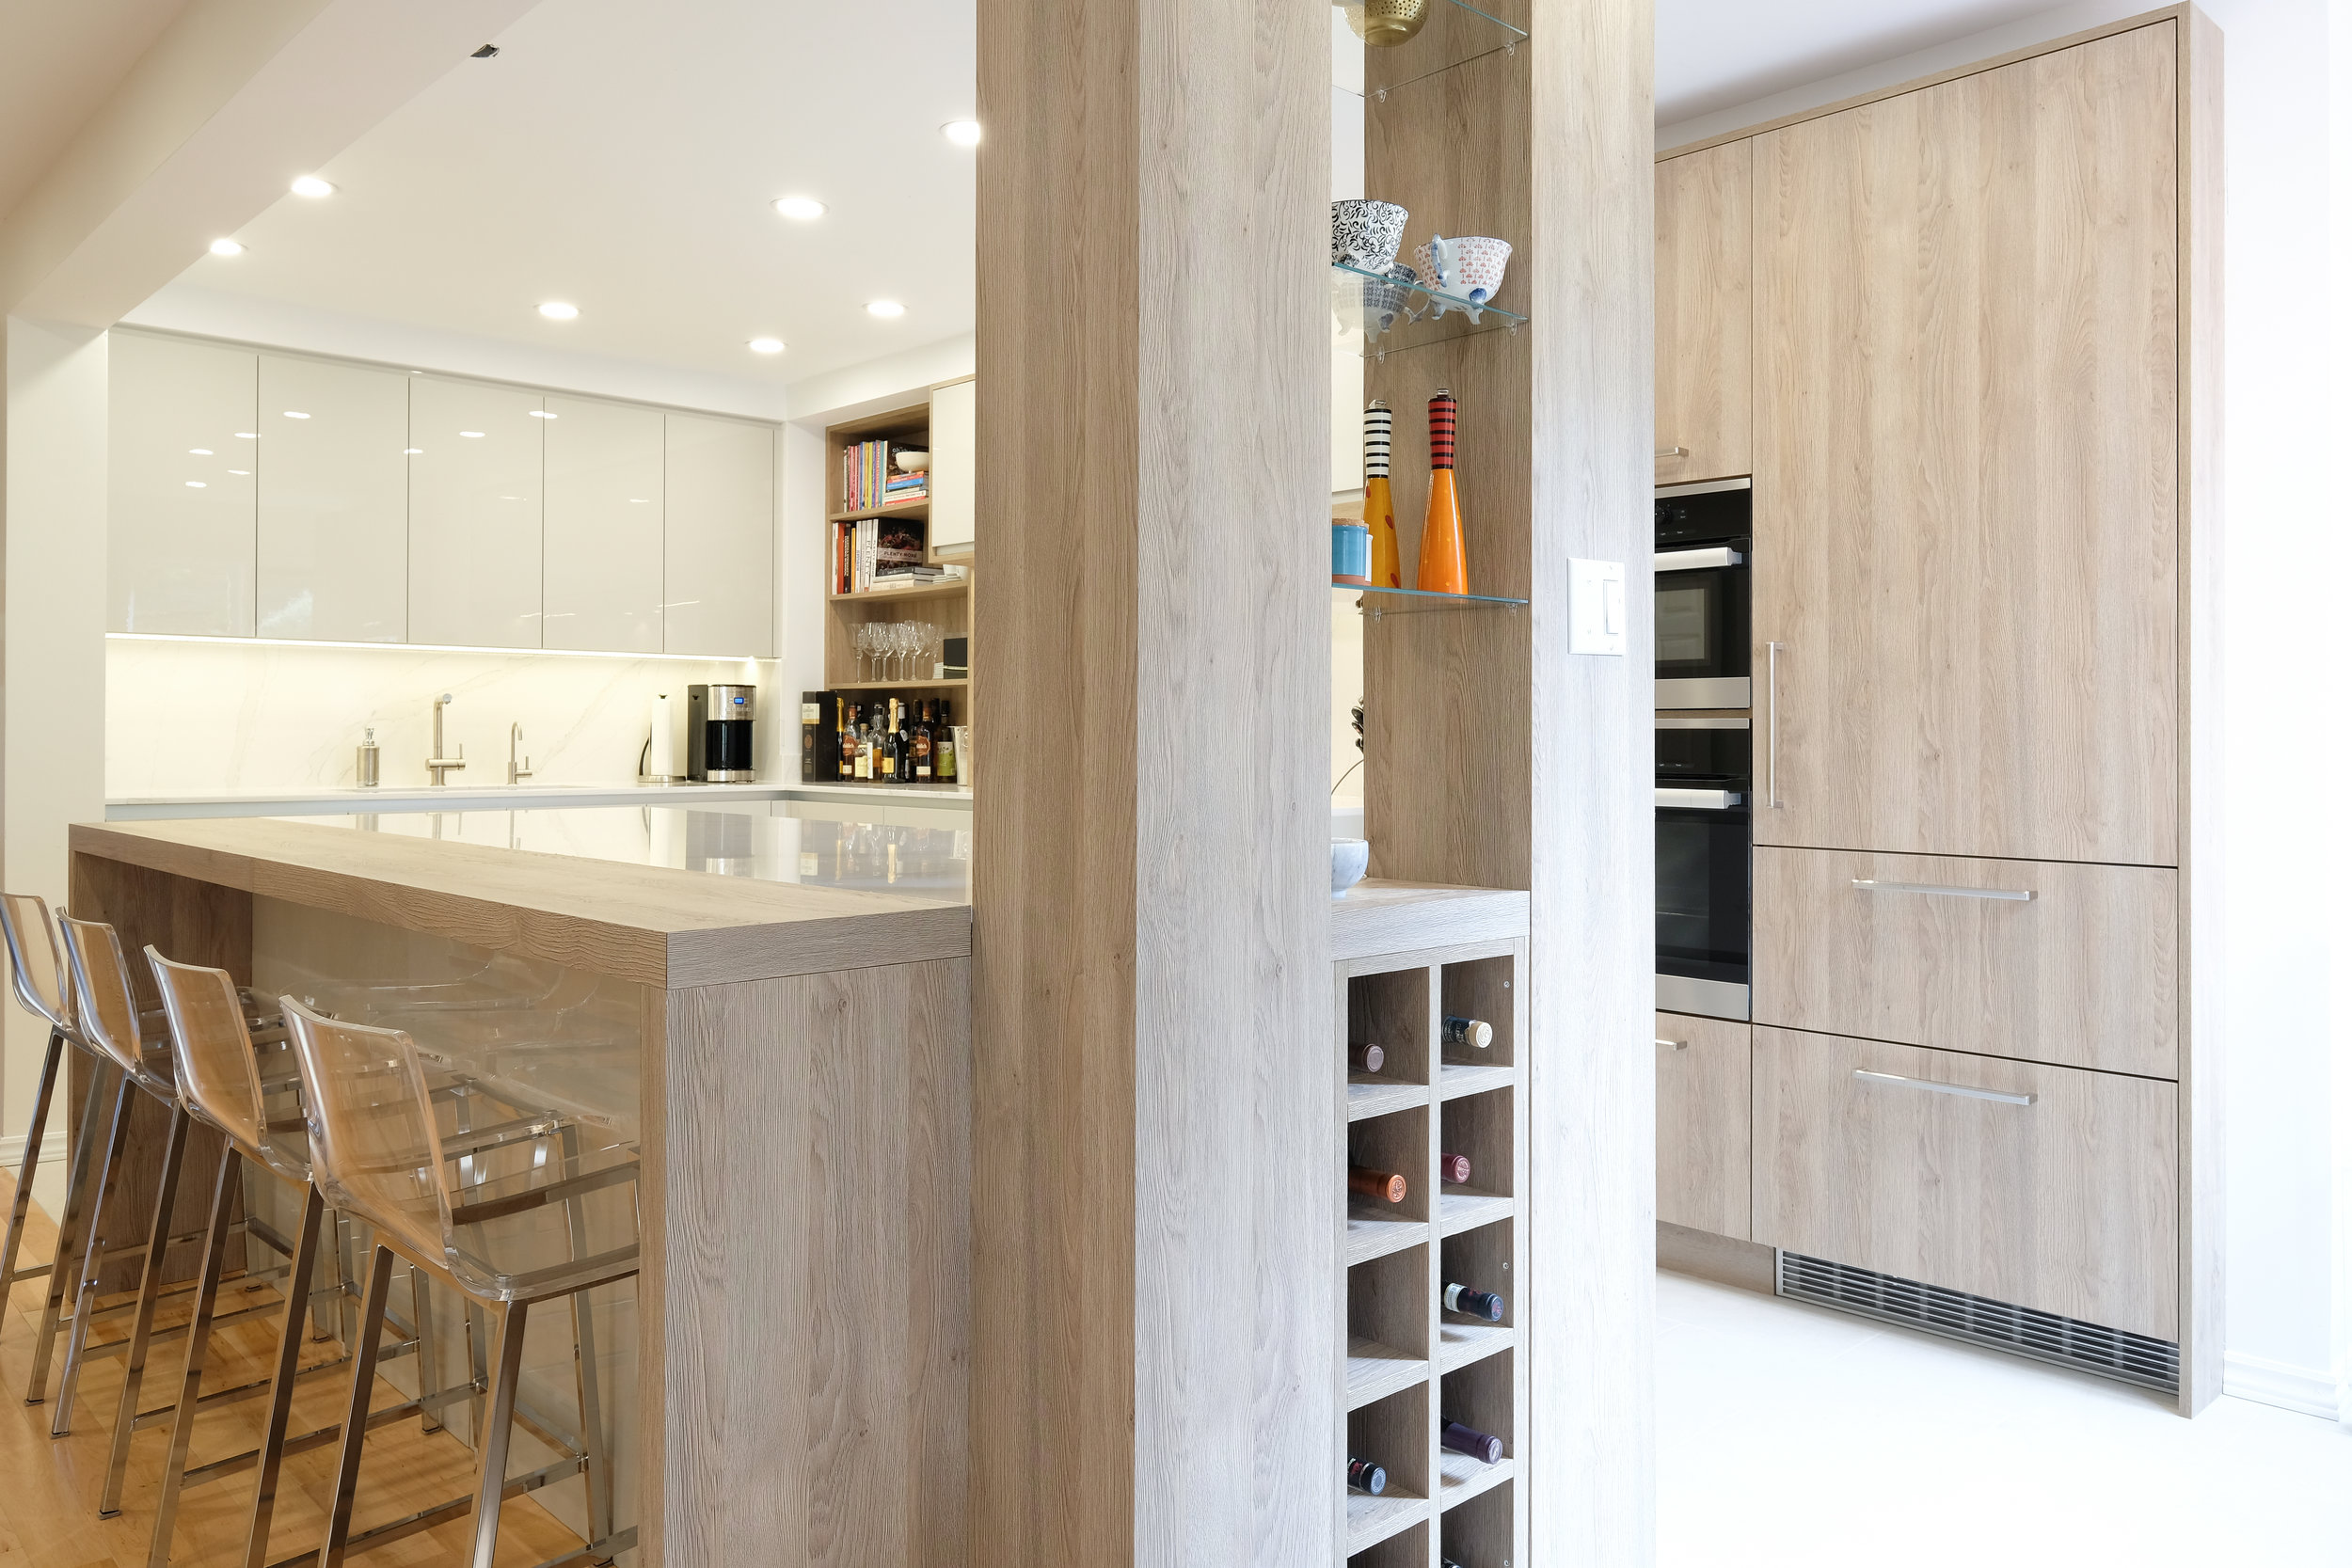 Beechwood Kitchen Built in Wine Rack.jpg